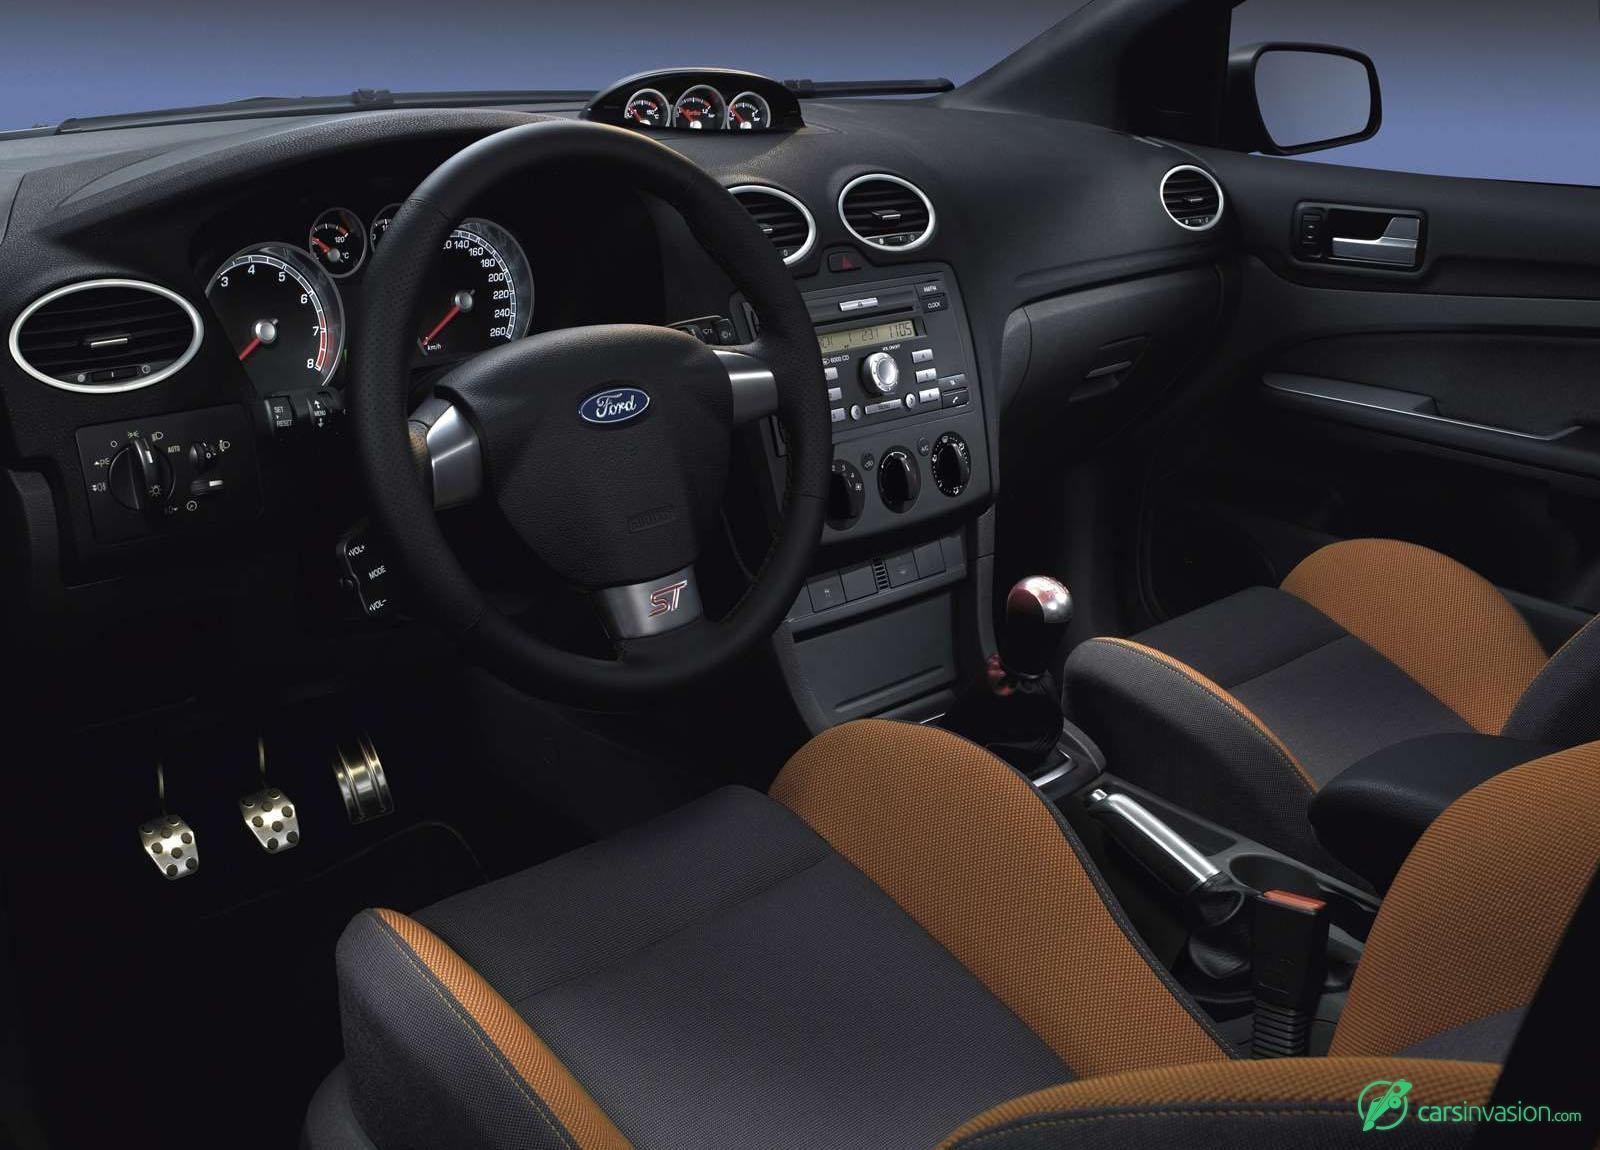 2006 Ford Focus St Hd Pictures Carsinvasion Com